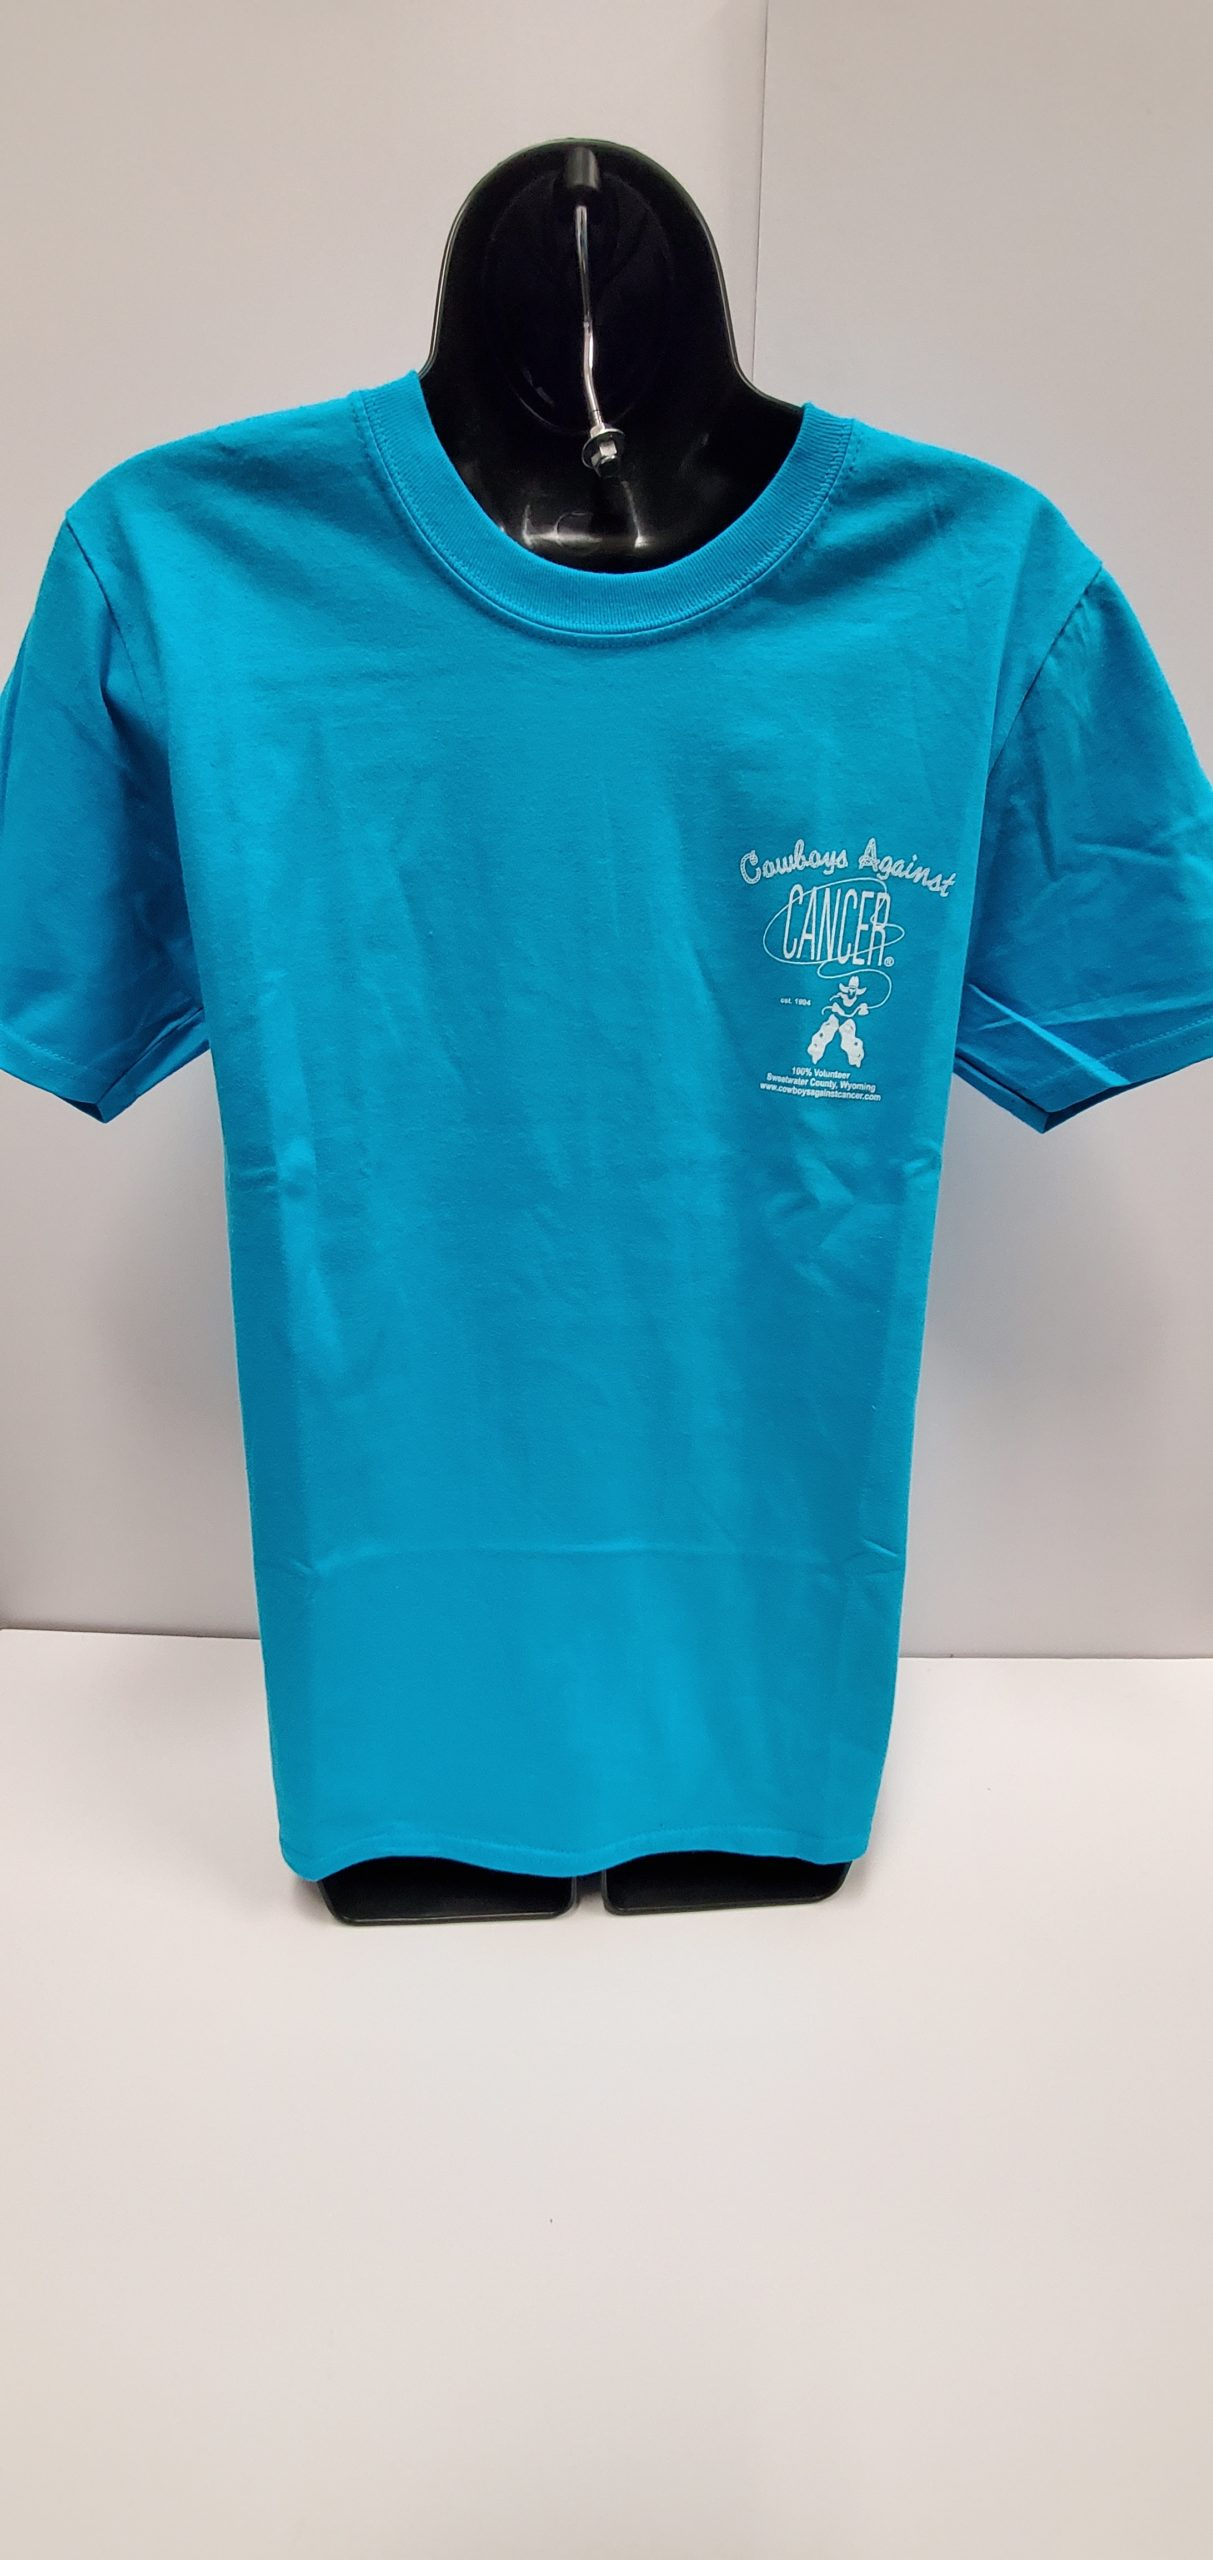 Teal – T-Shirt – Screen Print